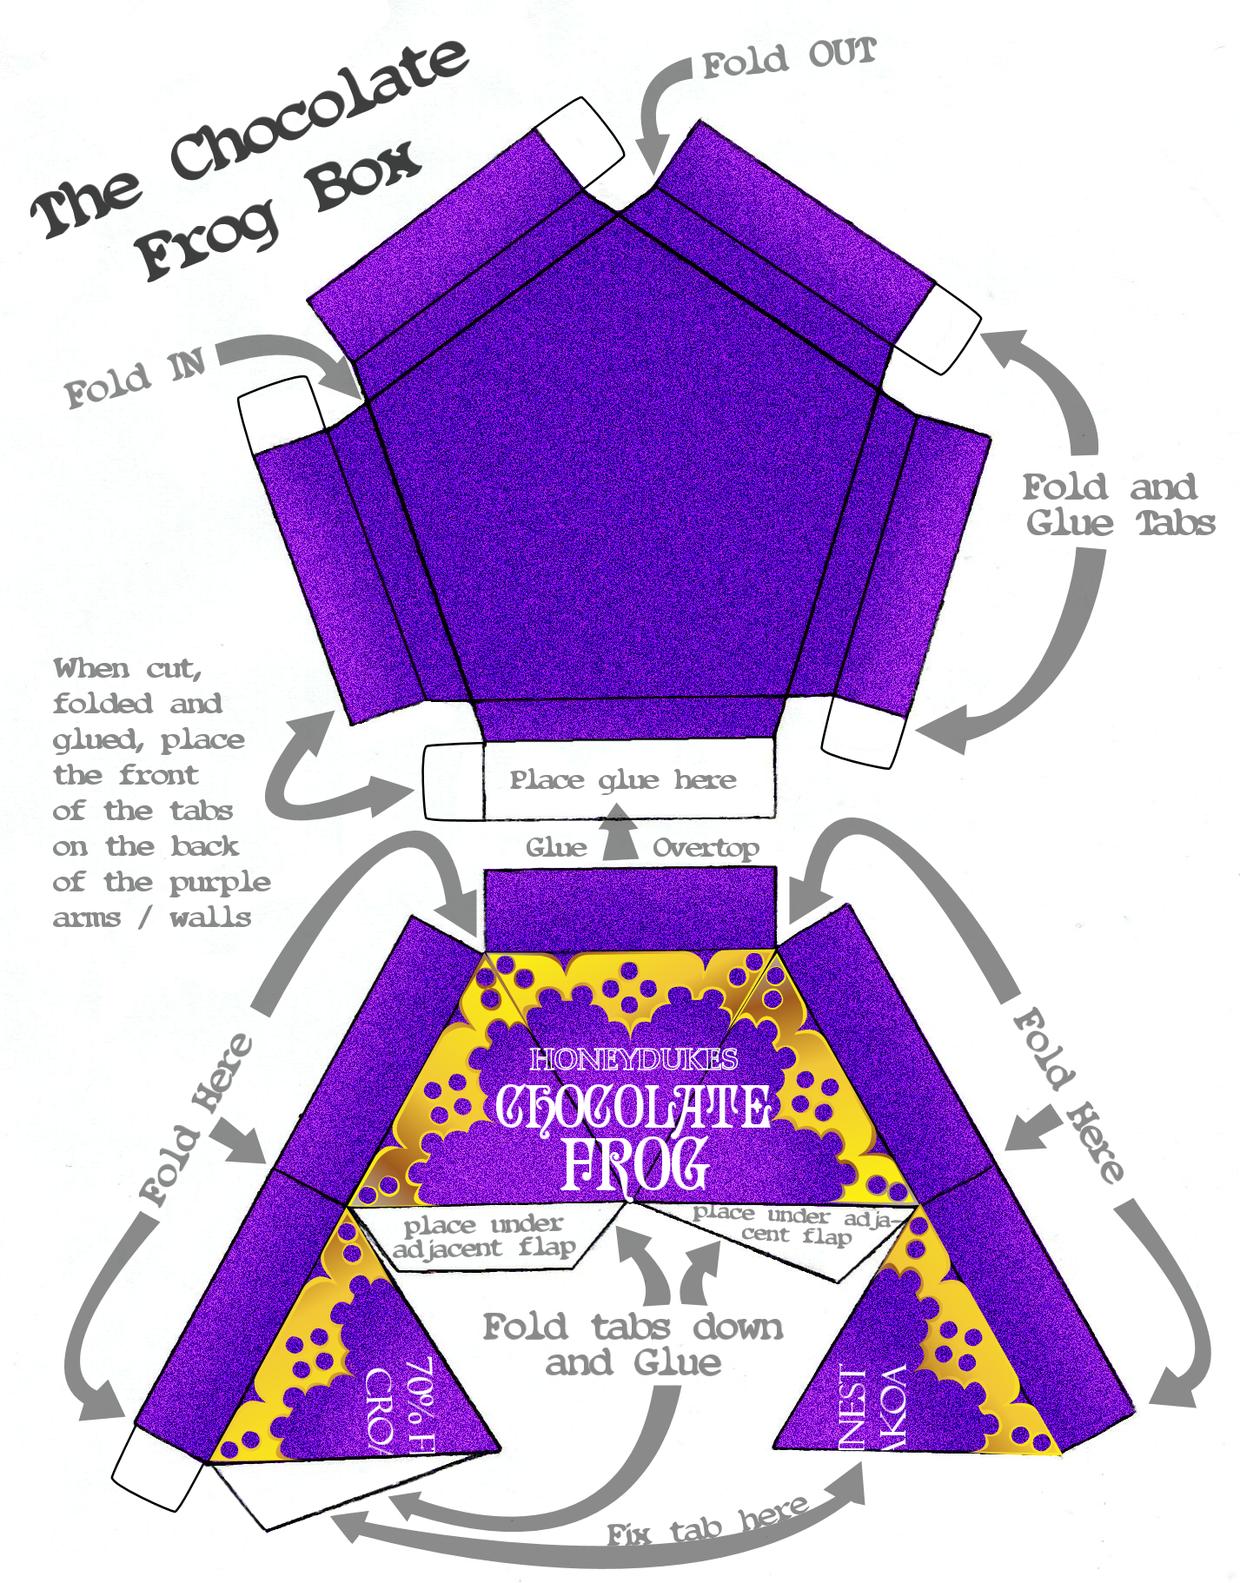 Chocolate_Frog_Box_Design_by_Gaddia